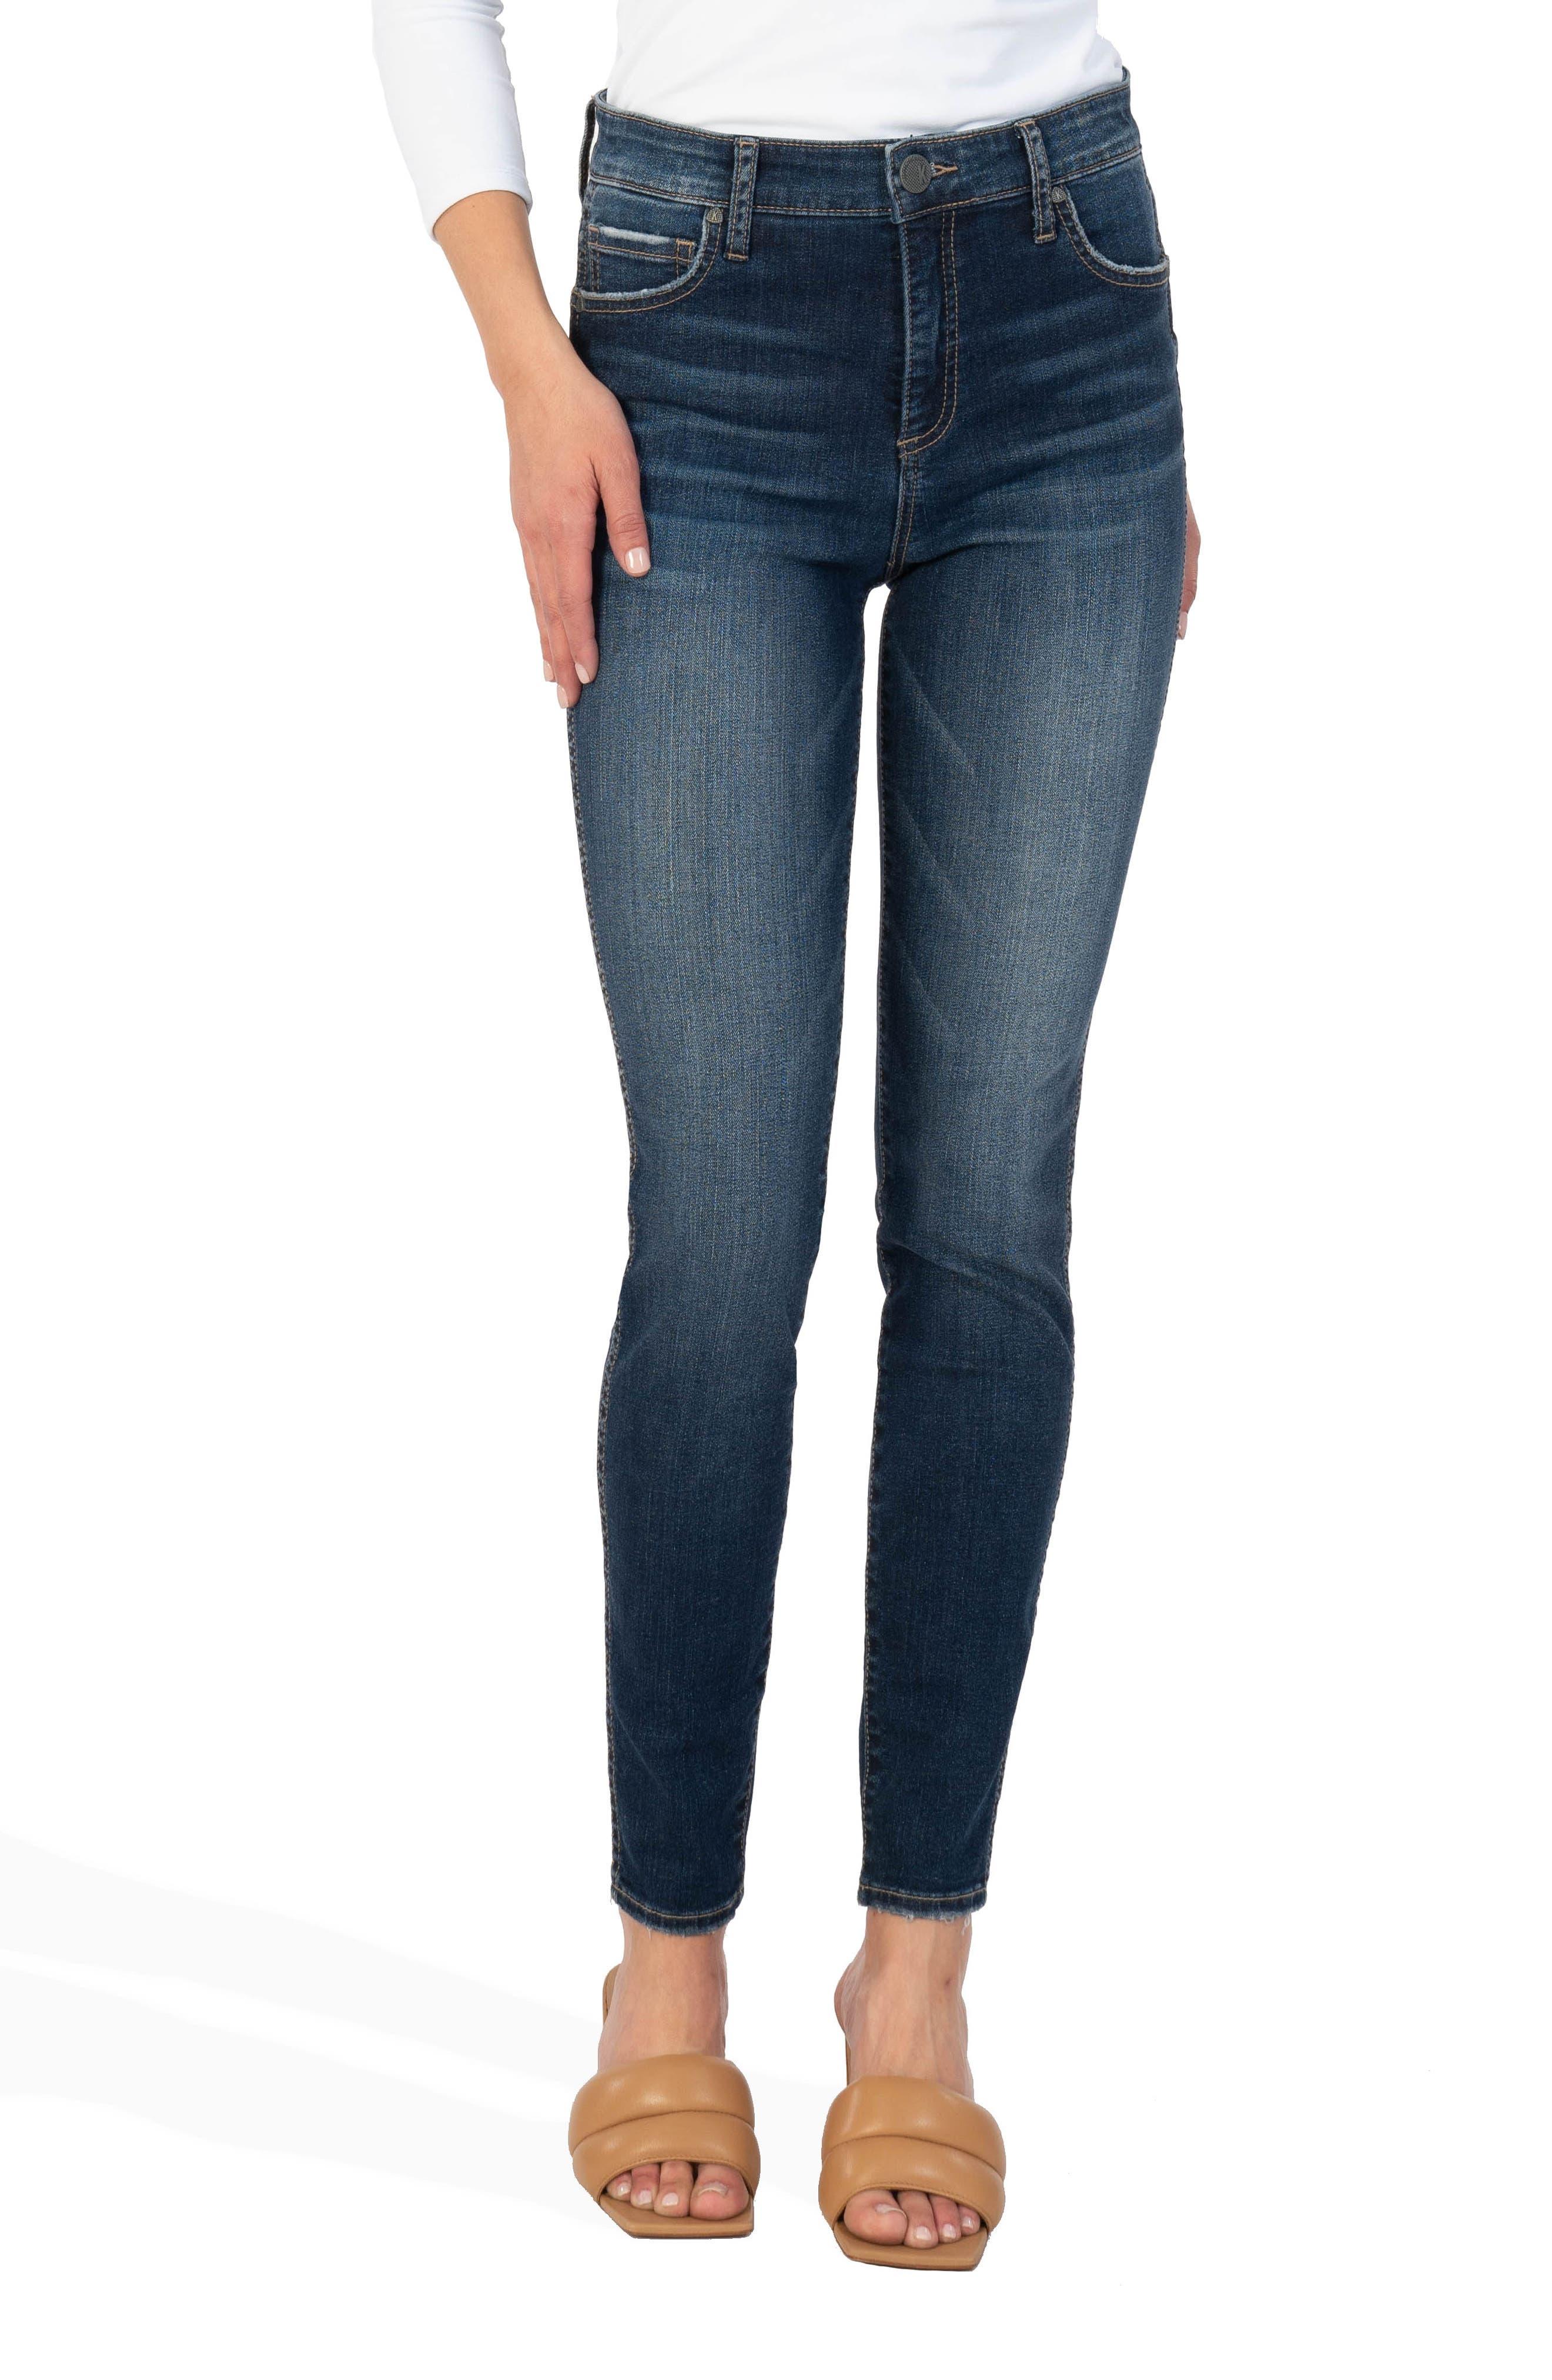 Mia Fab Ab High Waist Toothpick Skinny Jeans